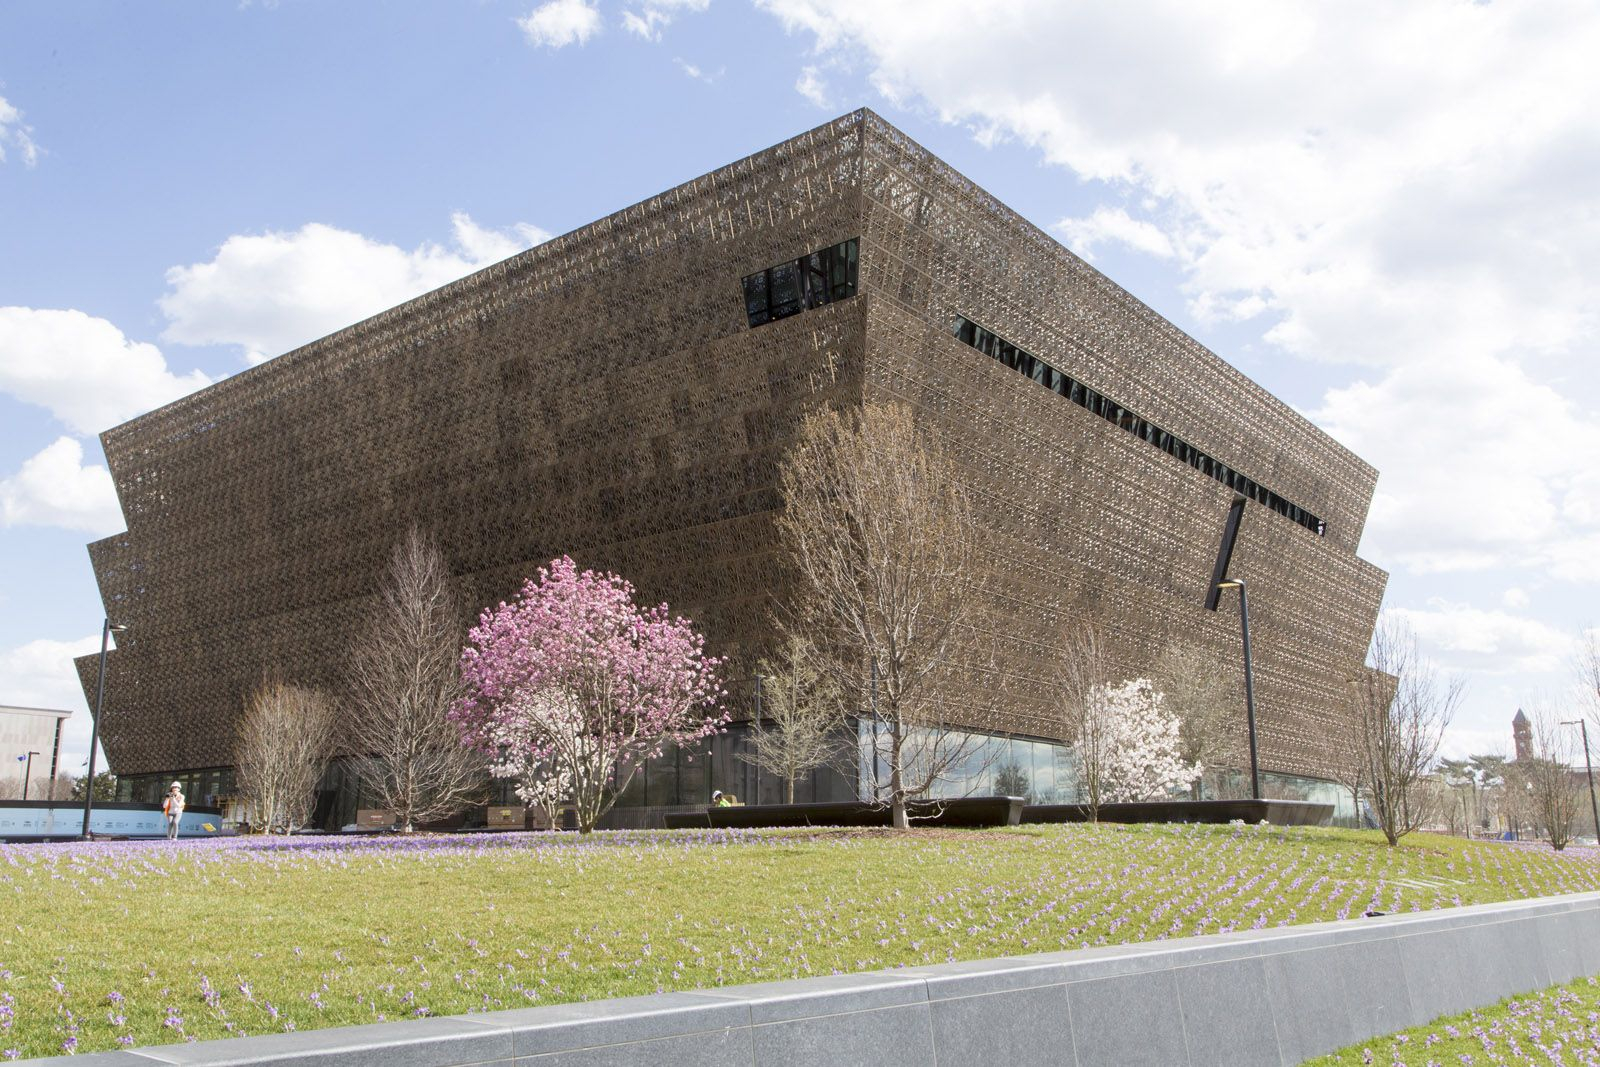 Adjaye Associates ; The Smithsonian Museum of African American History